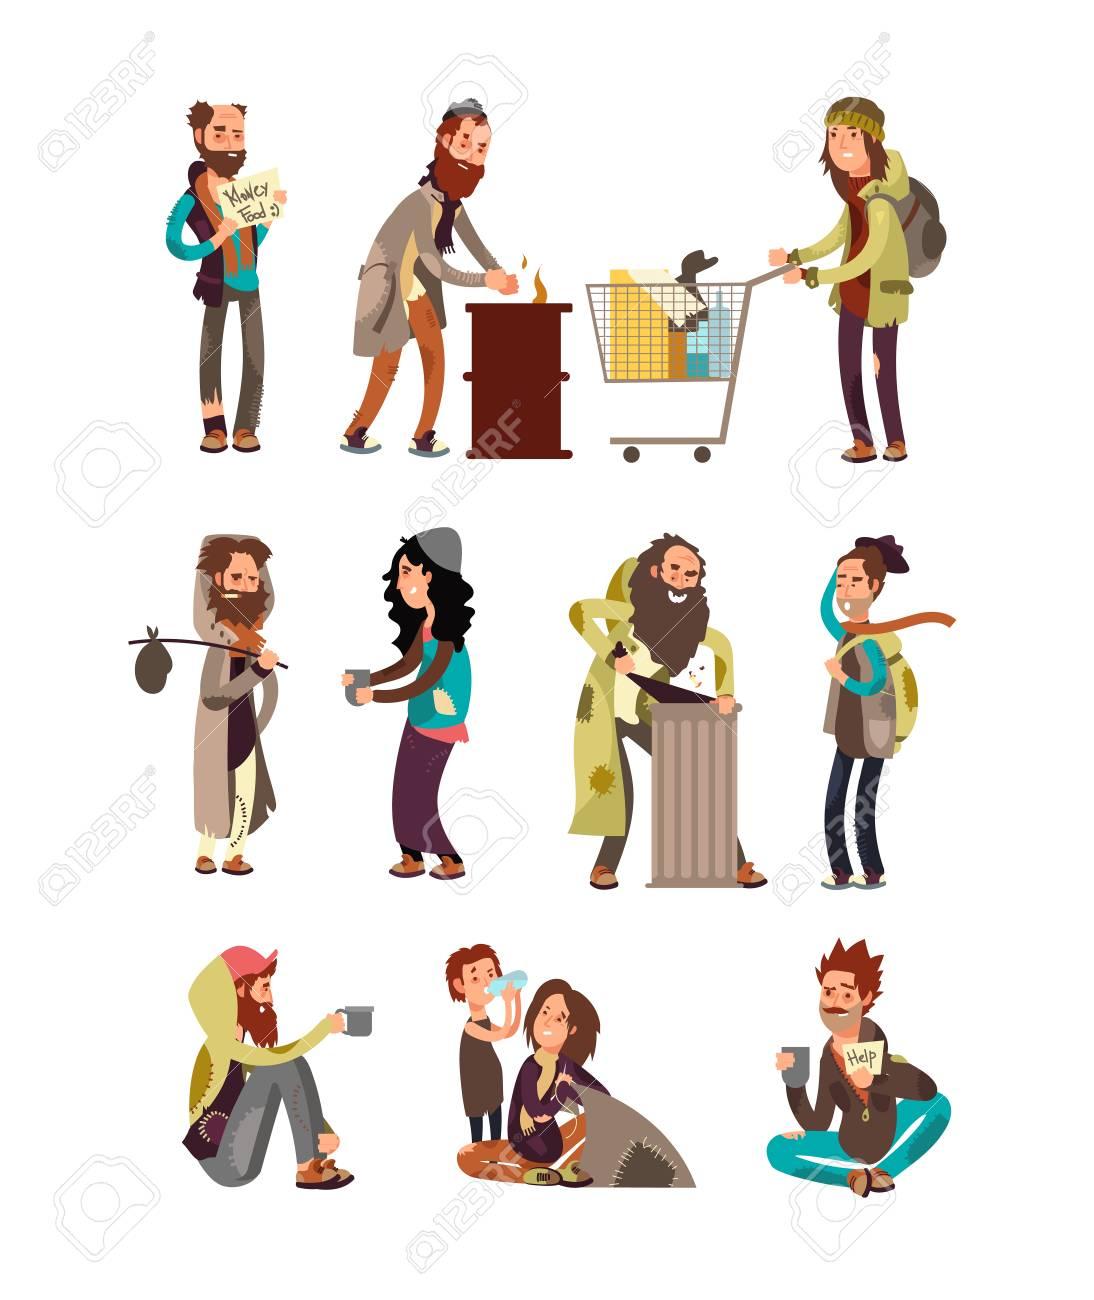 Poor unhappy homeless cartoon people needing financial help. Vector characters set - 93451398